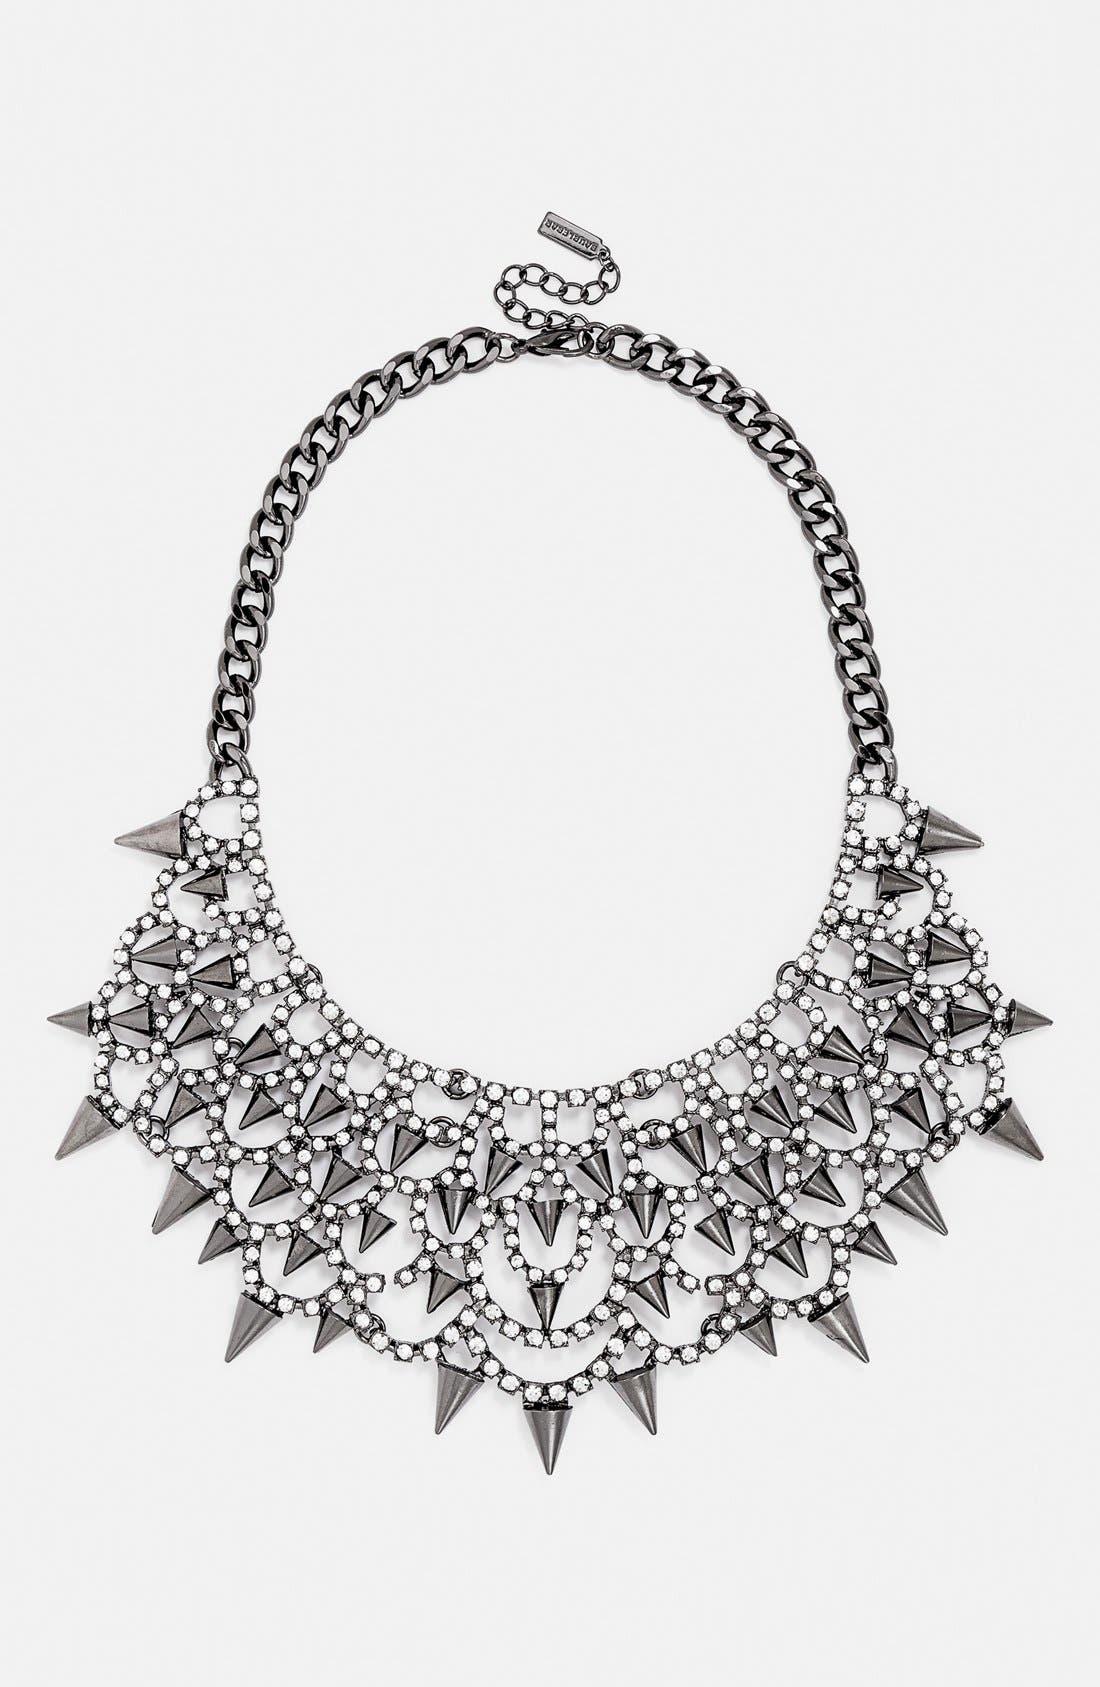 Alternate Image 1 Selected - BaubleBar 'Gothic Fang' Bib Necklace